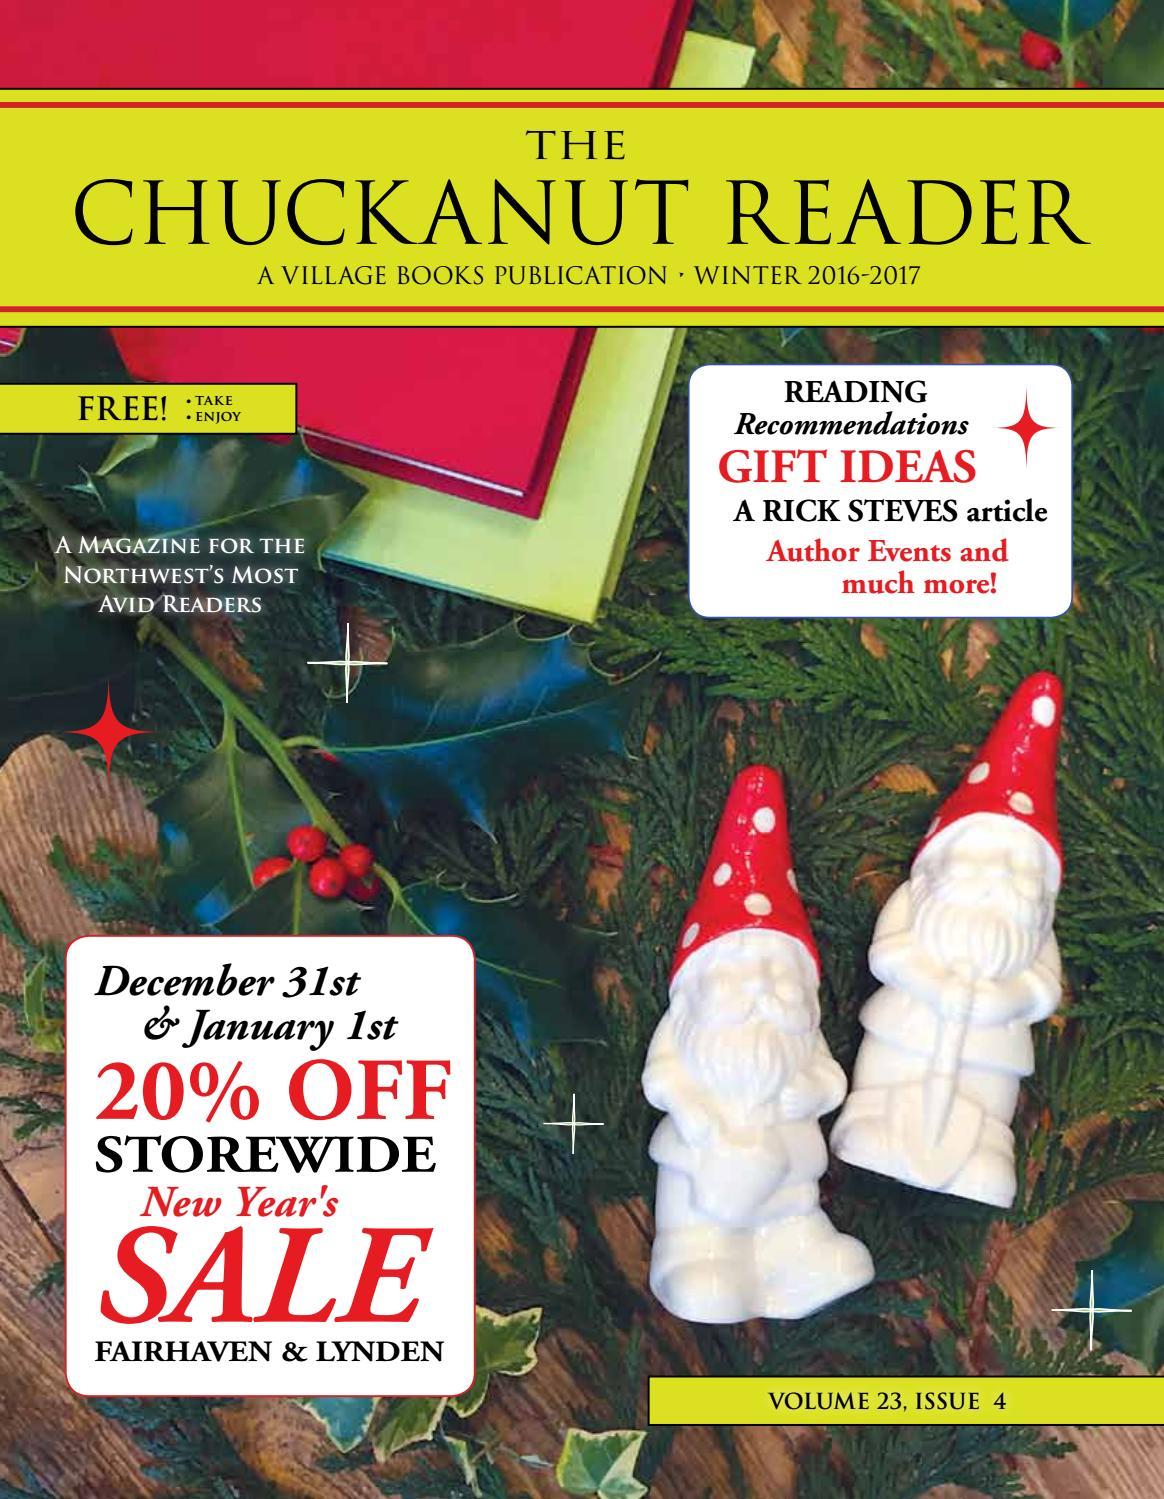 Chuckanut reader   fall 2016 by chuck robinson   issuu